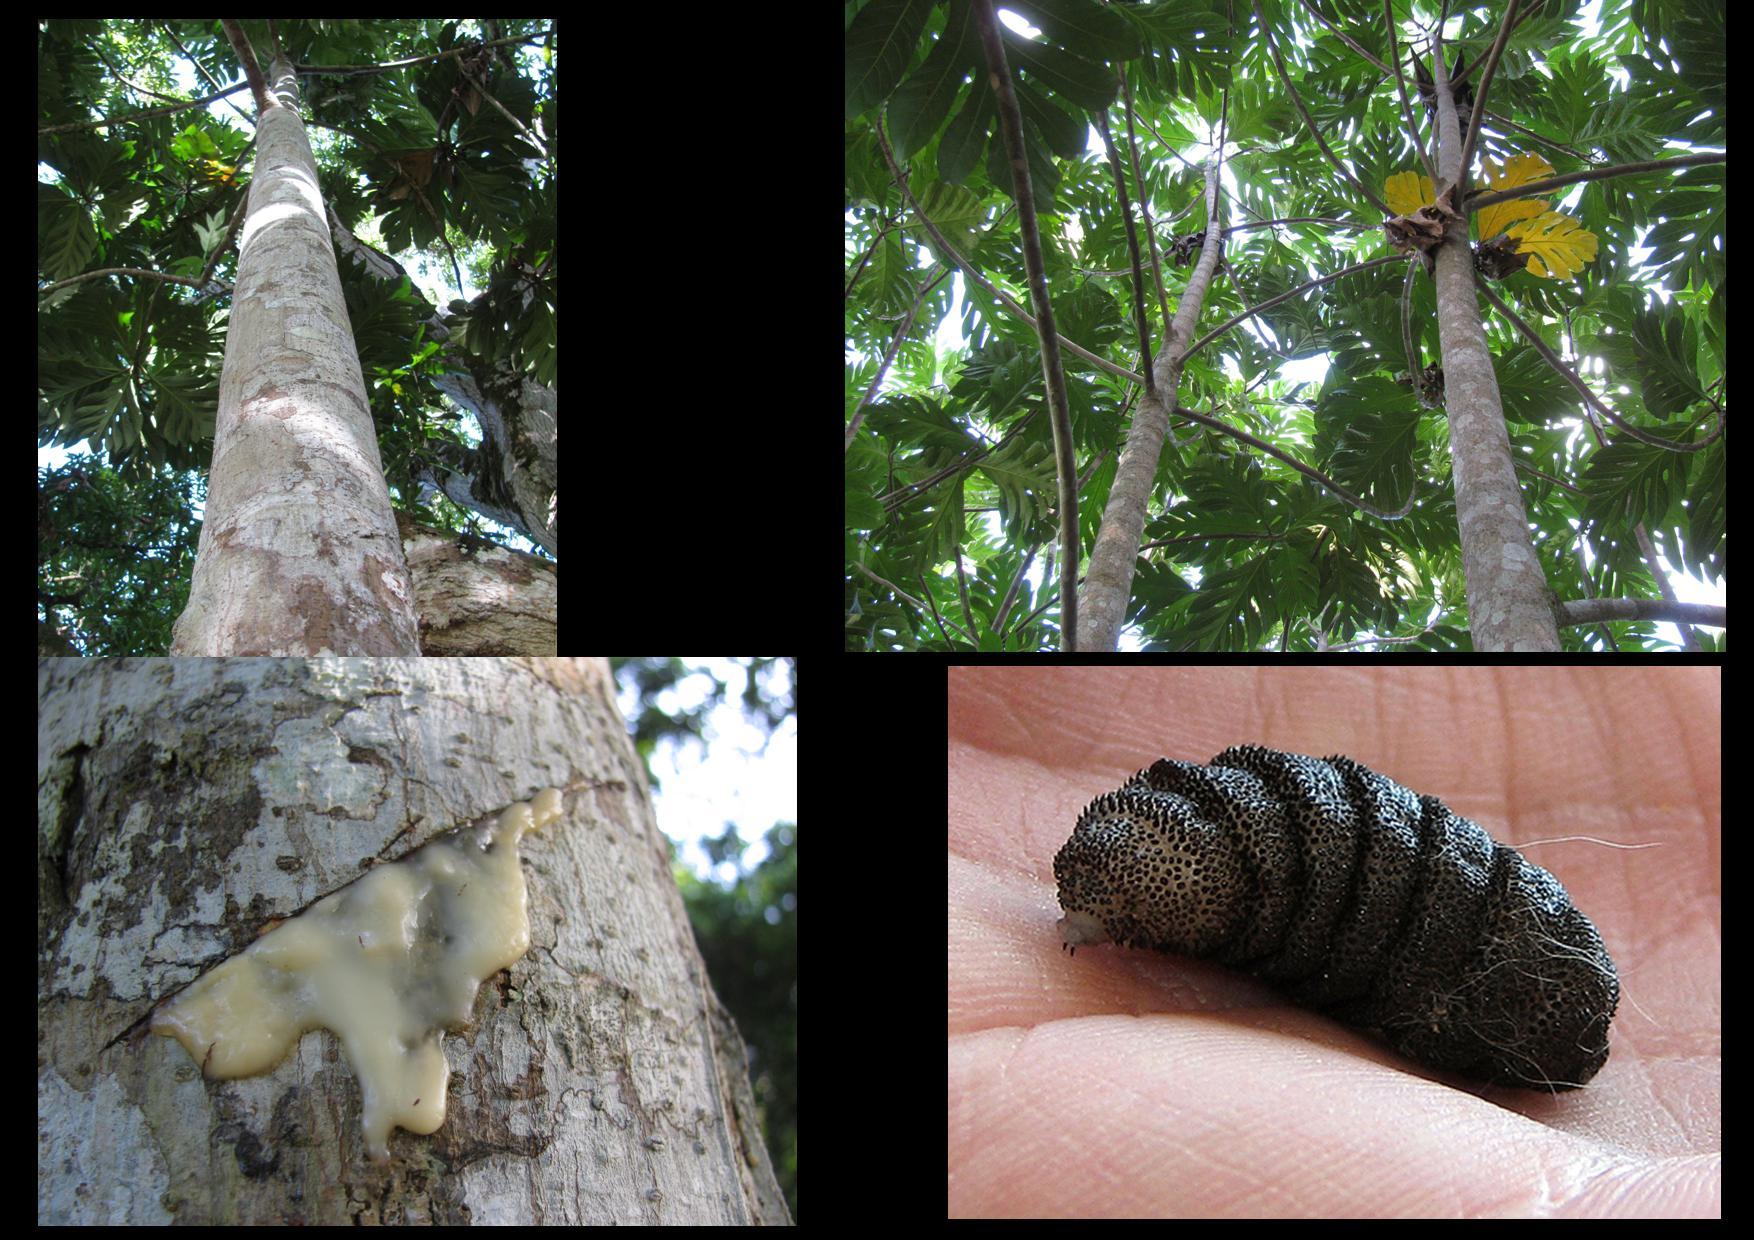 Breadfruit Sap and Bot Fly Larva